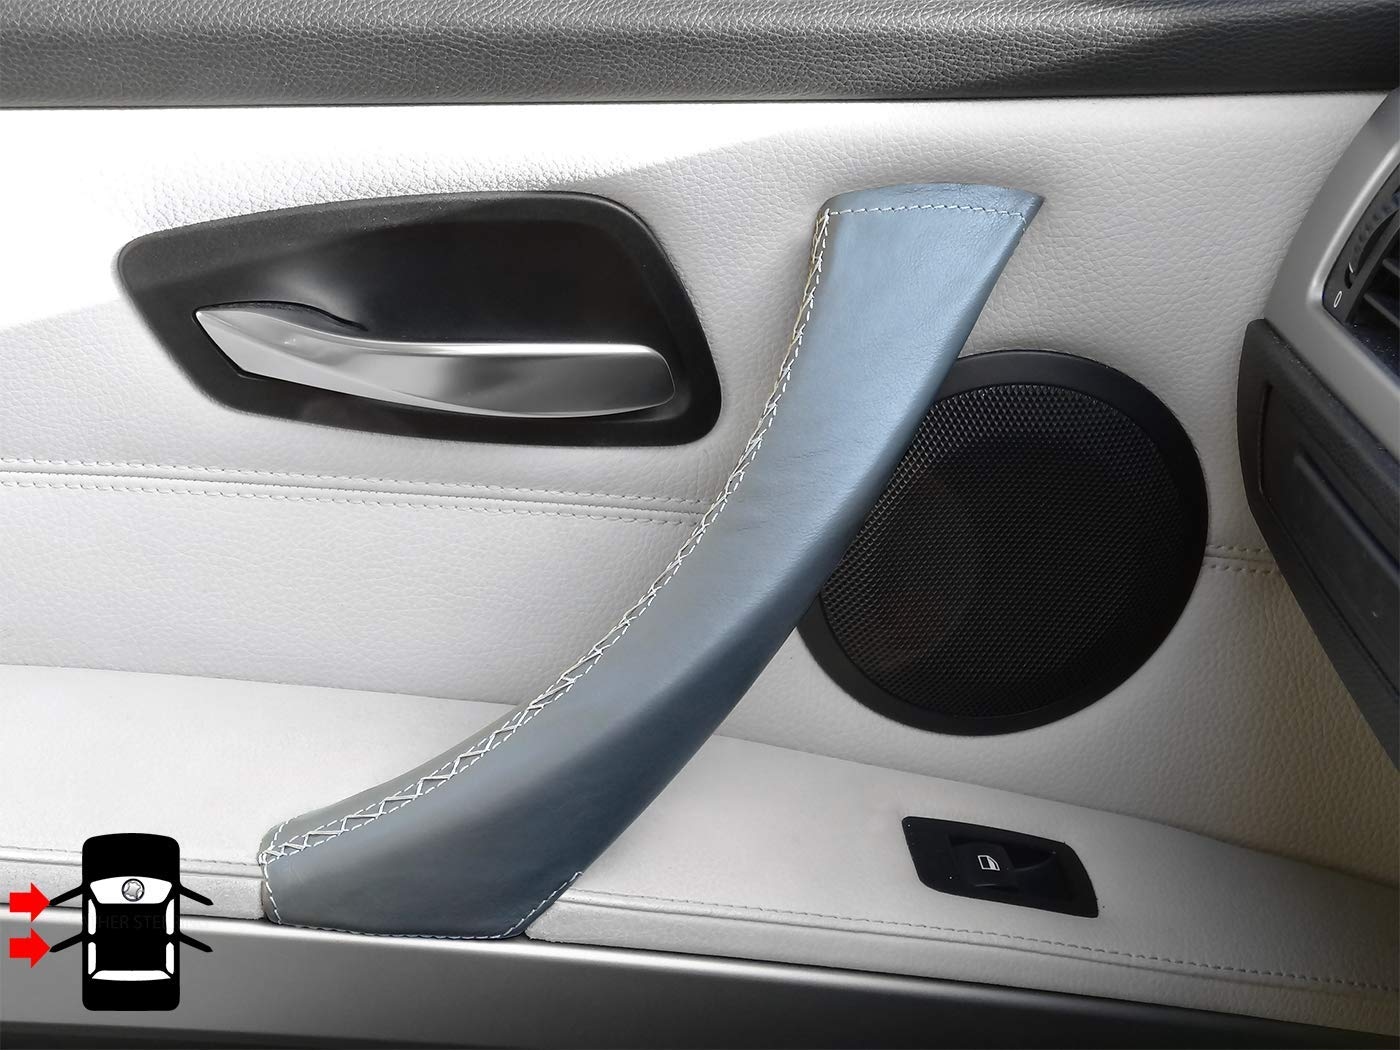 Right, Black Leather Passenger Door Handle Cover 3 Series E90 E91 E92 E93